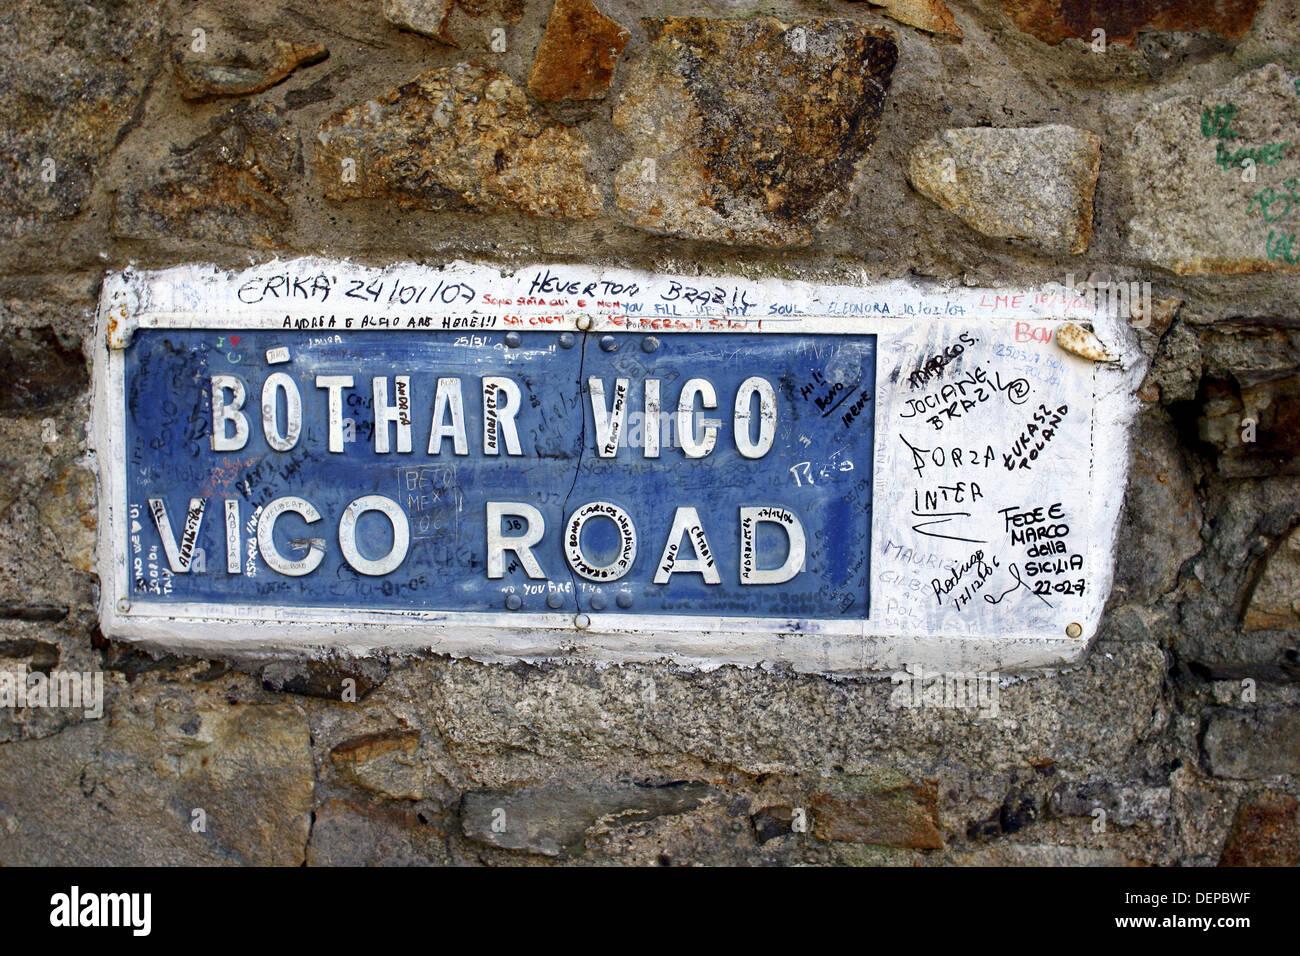 U2 graffiti wall location - Ireland County Dublin Killiney Vico Road U2 Graffiti In Front Of Bono S House